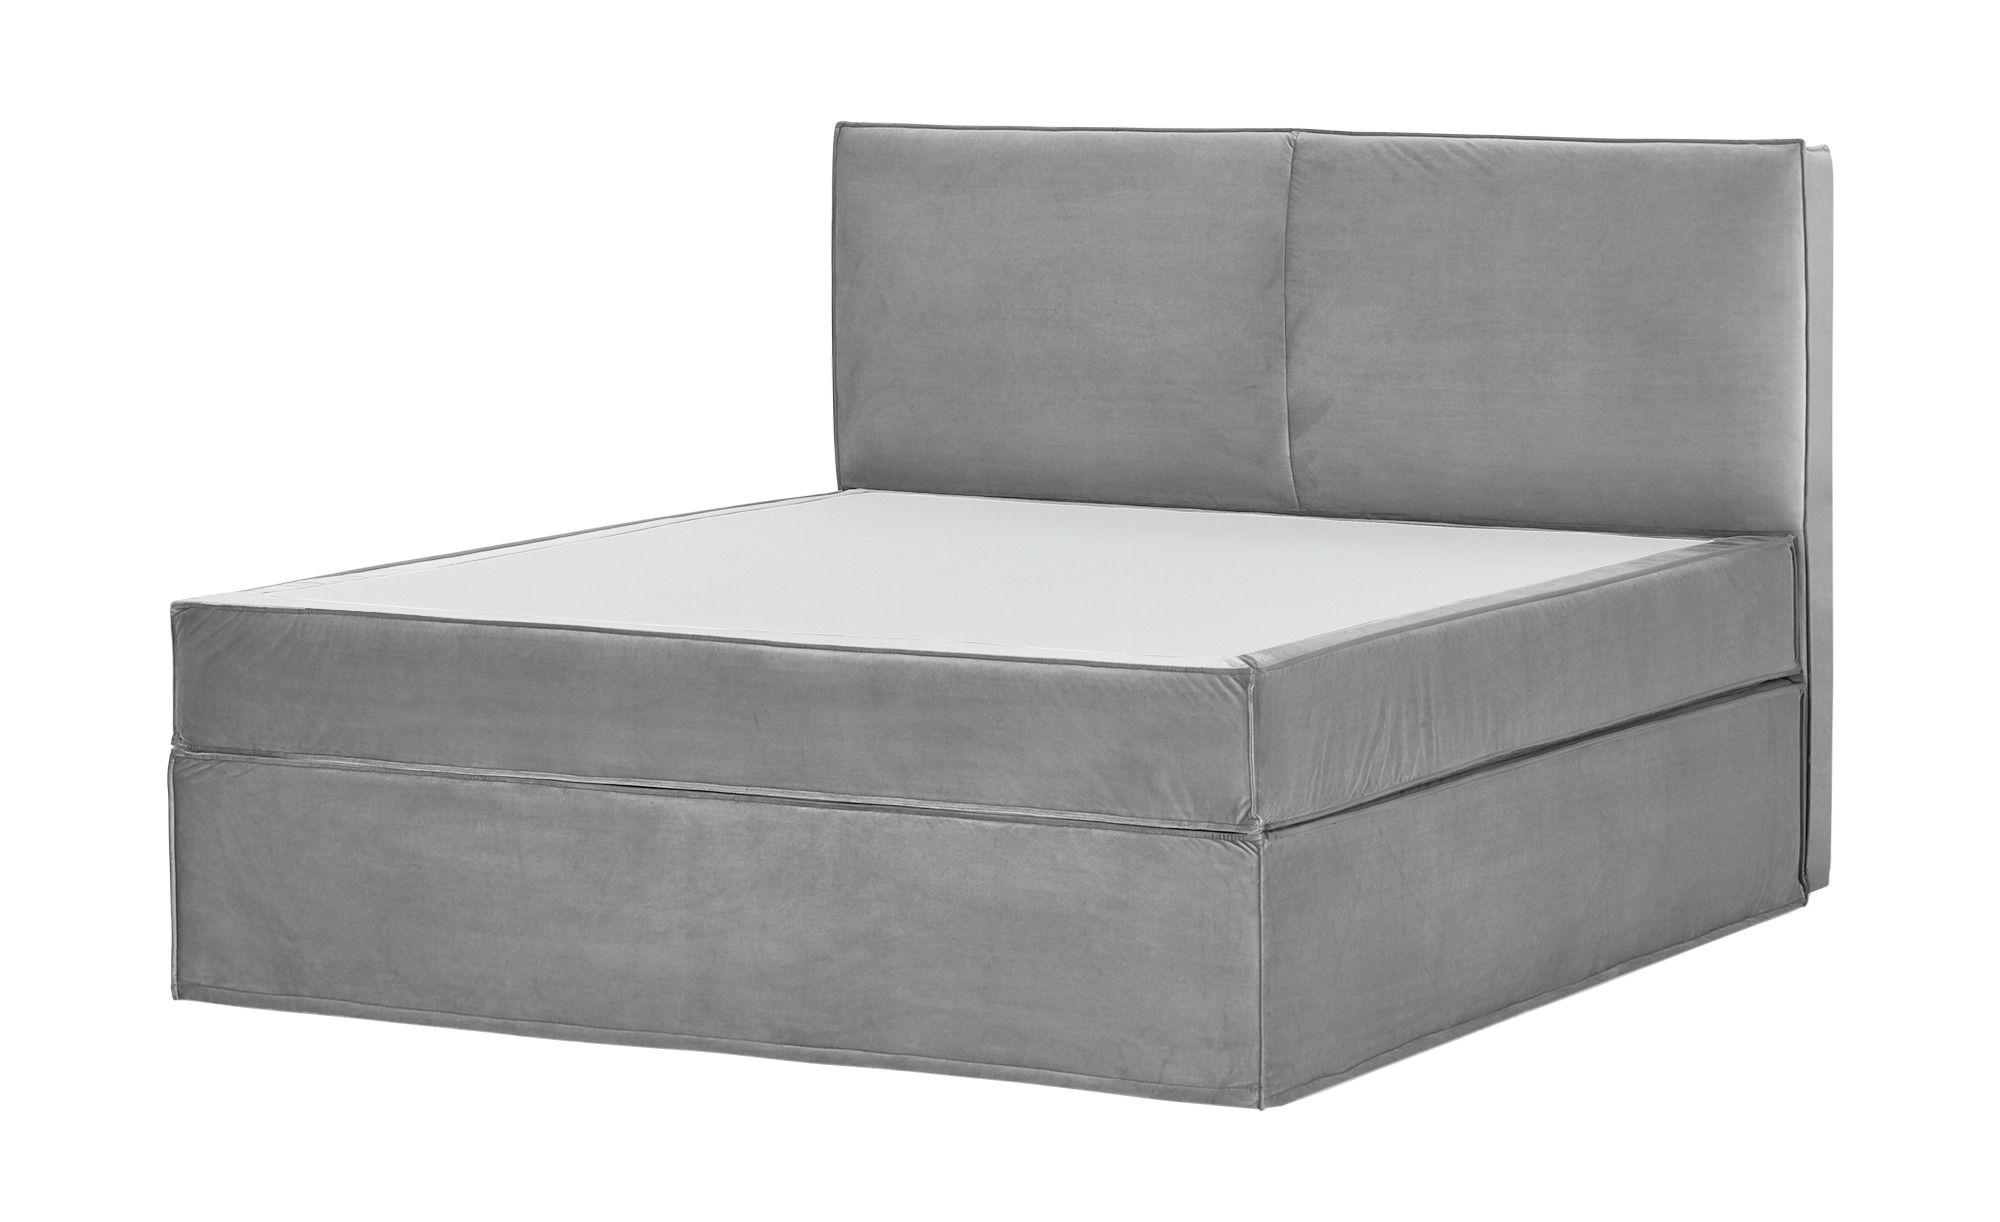 Photo of Boxi box spring bed, found at Möbel Höffner